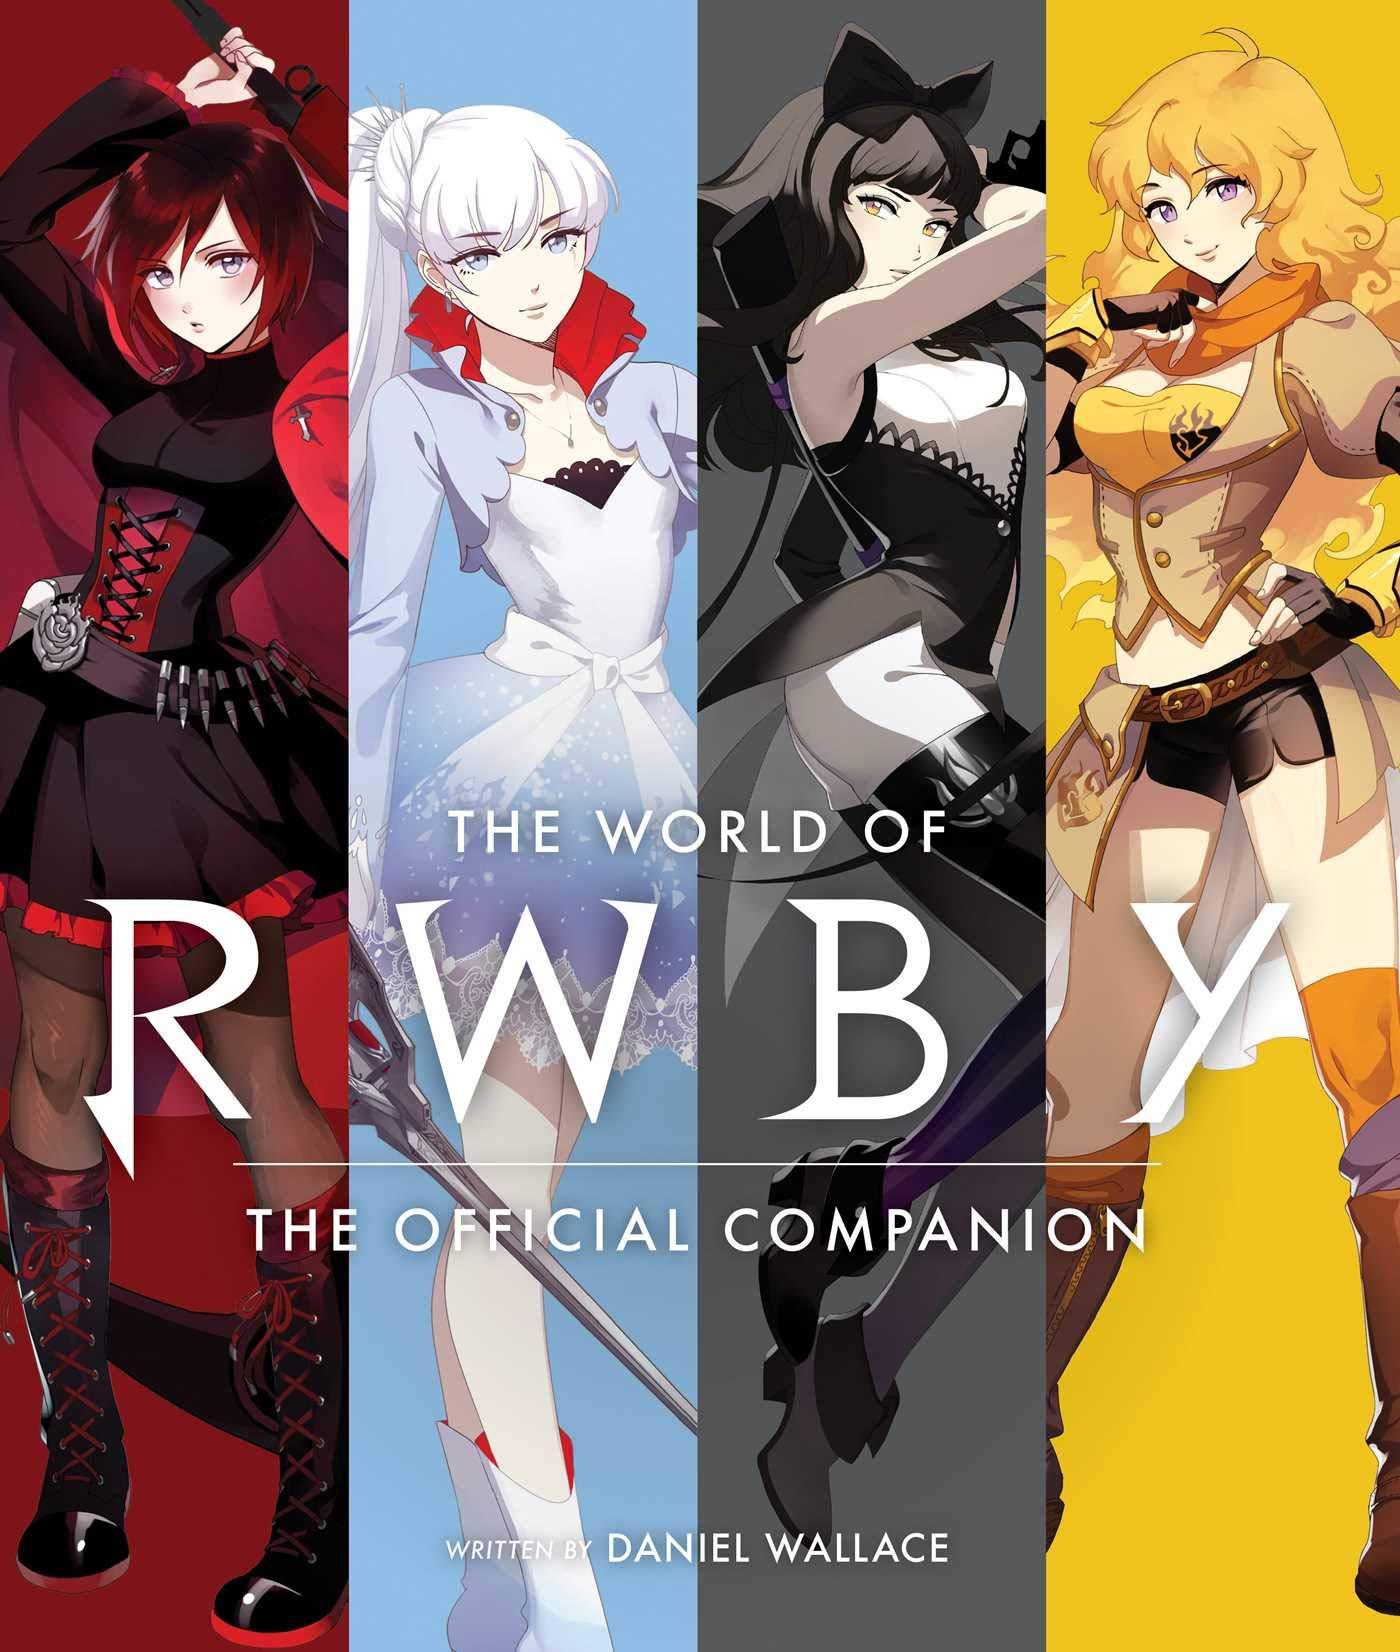 The World of RWBY: The Official Companion by VIZ Media LLC